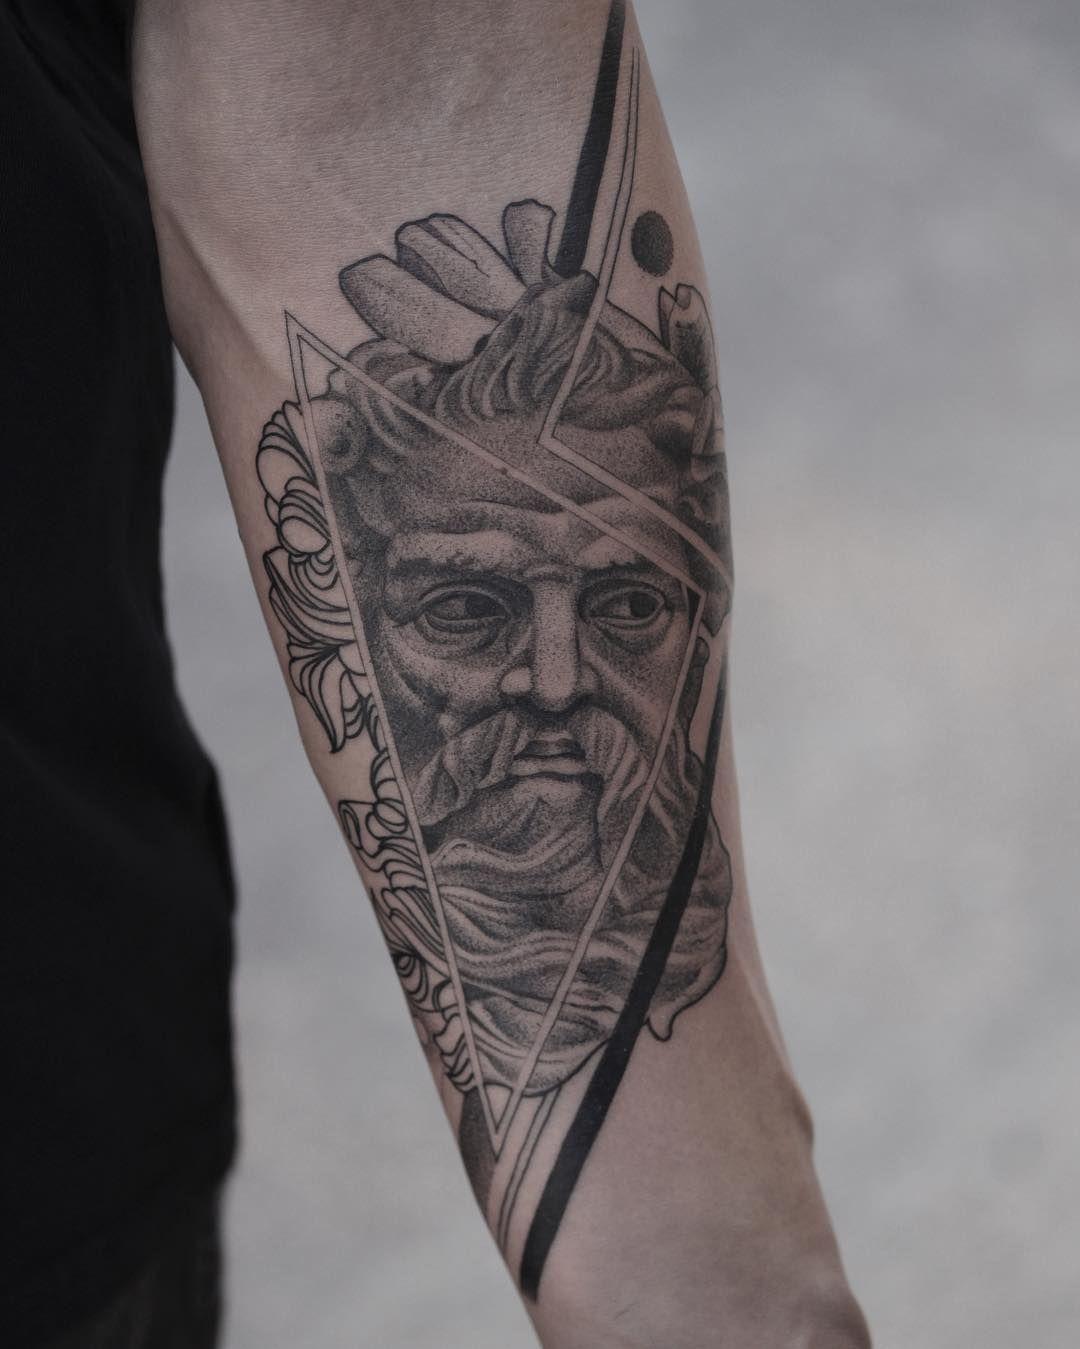 Classical sculpture u tattoos on men u pinterest tattoo and